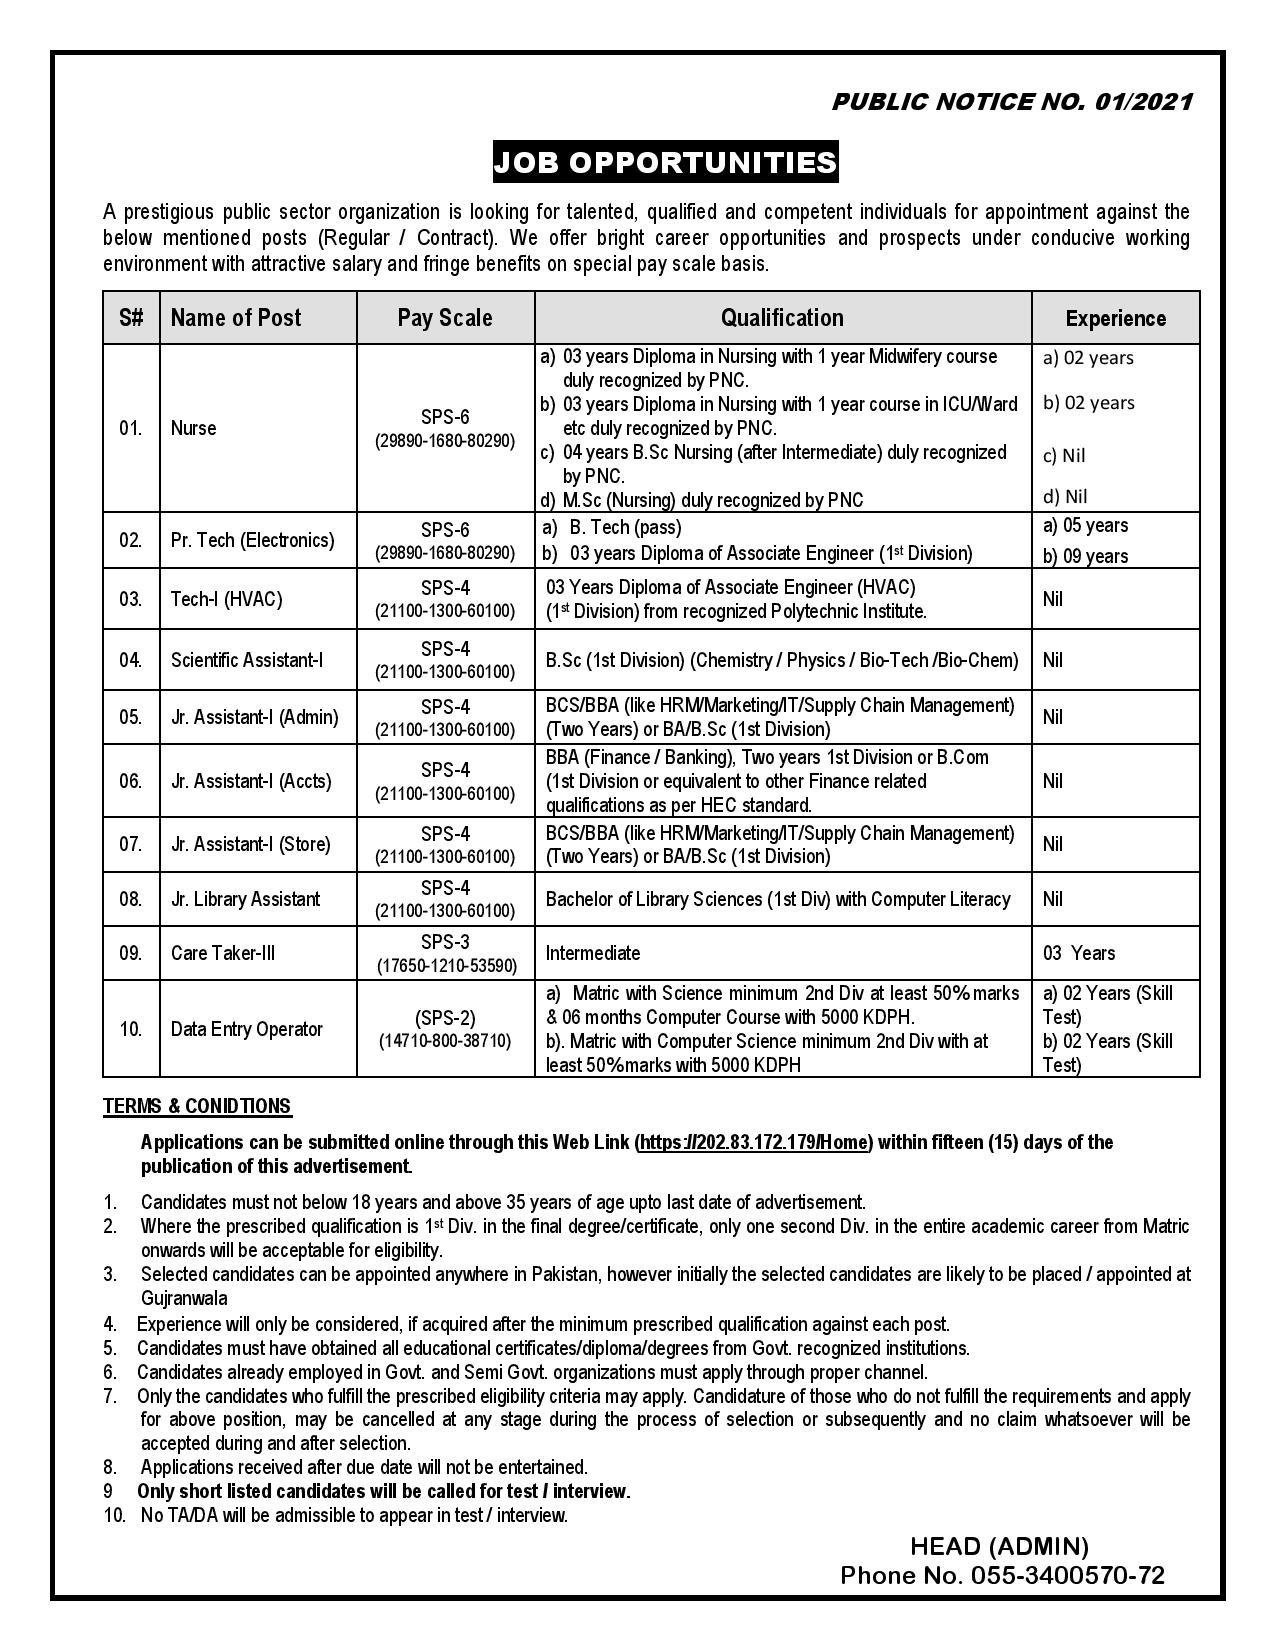 PAEC Jobs 2021|Public Notice No. 01/2021|Pakistan Atomic Energy Commission Jobs 2021| Latest in Chashma, Punjab